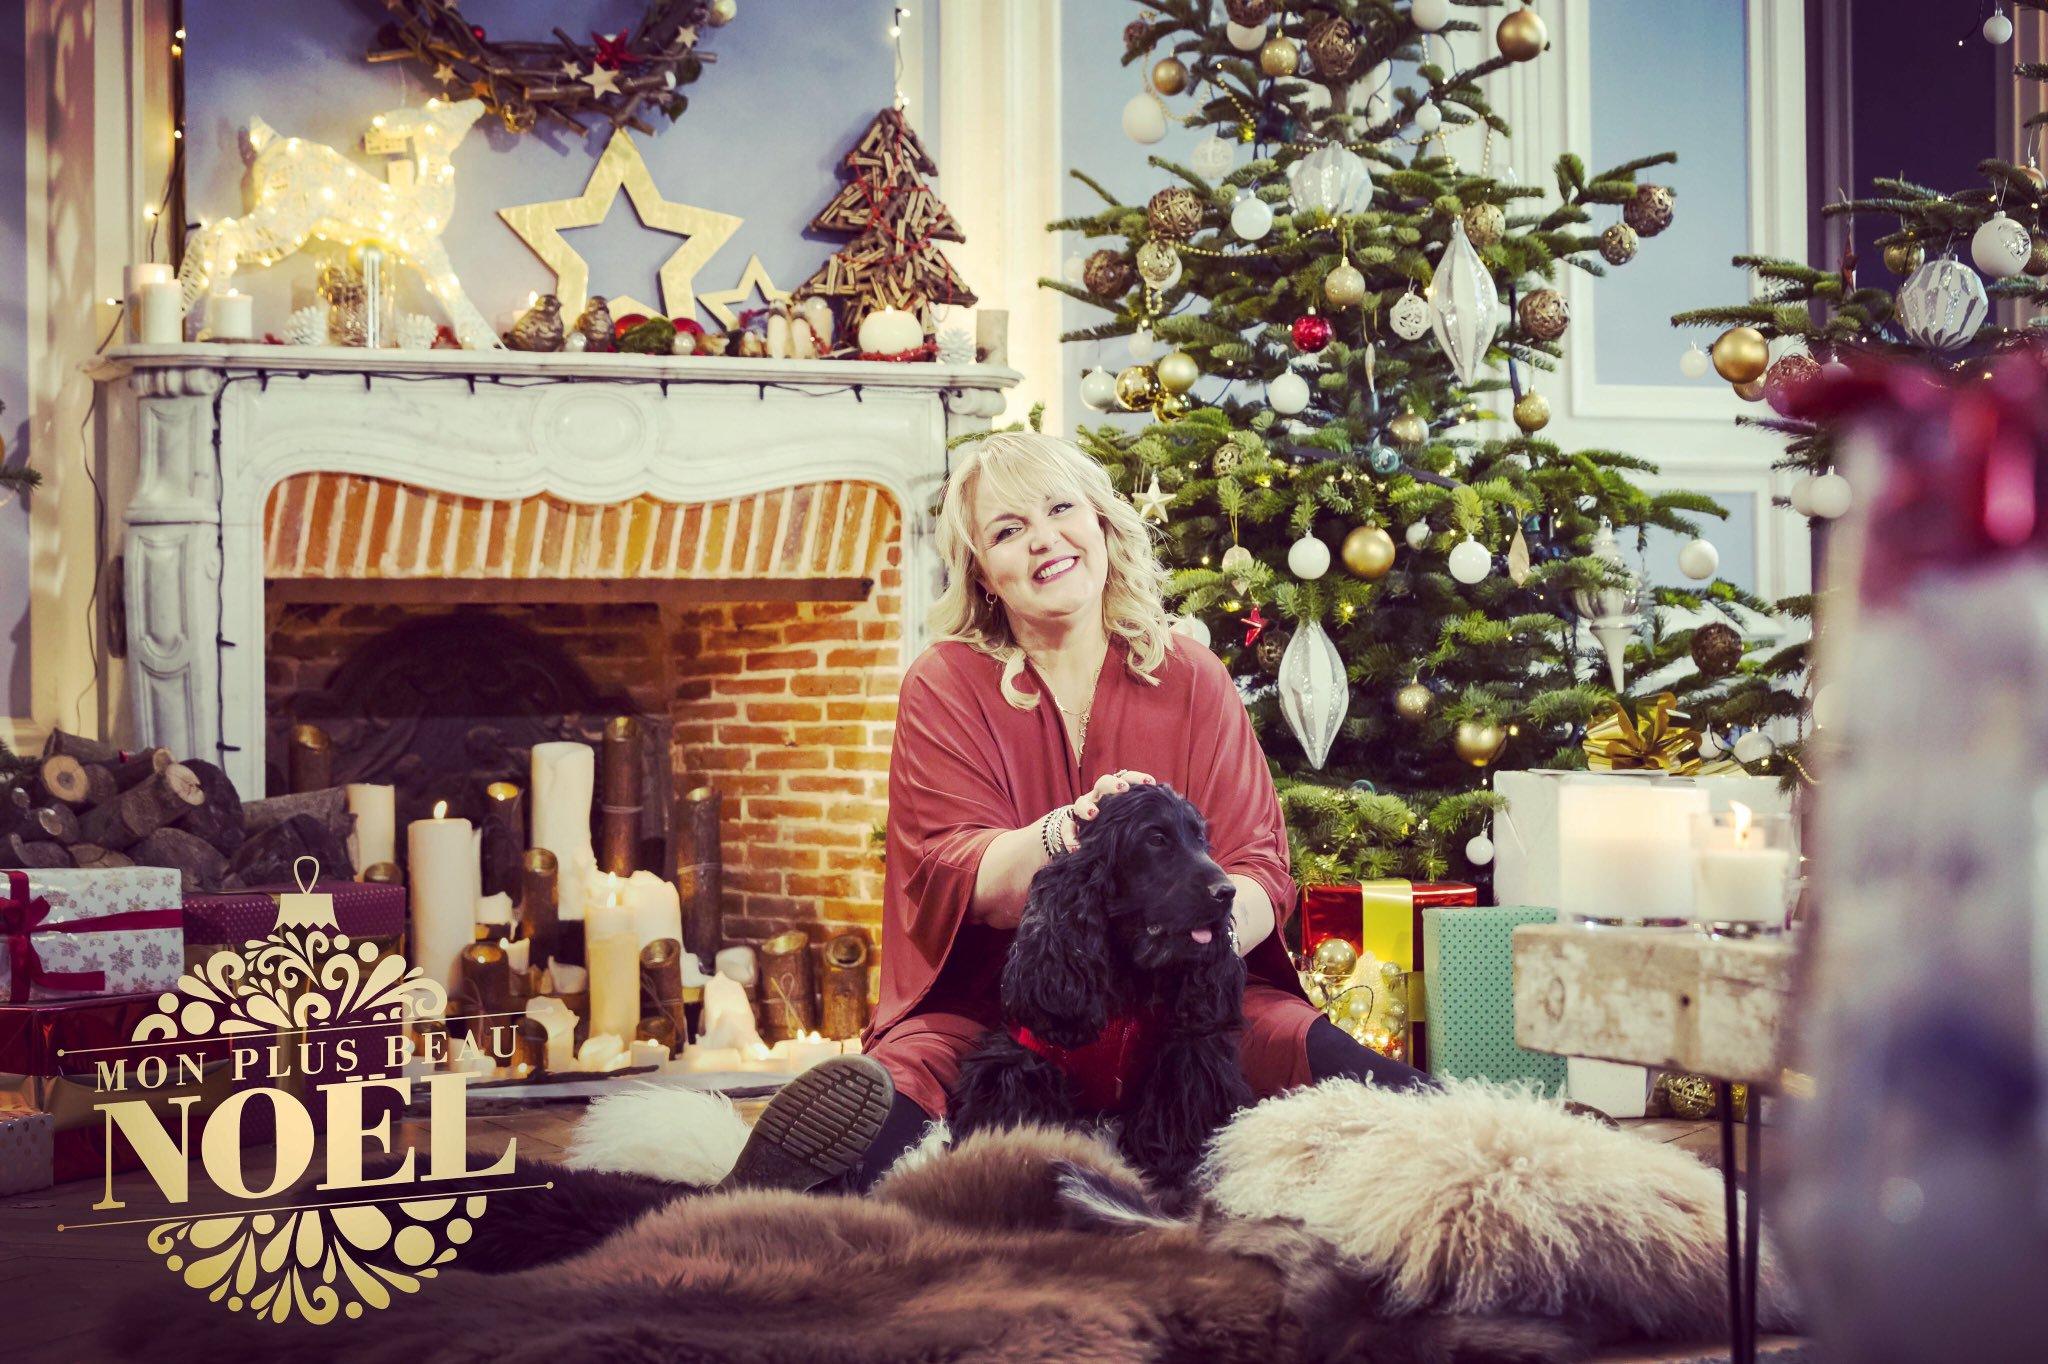 Mon plus beau Noël - TF1 - Valérie Damidot